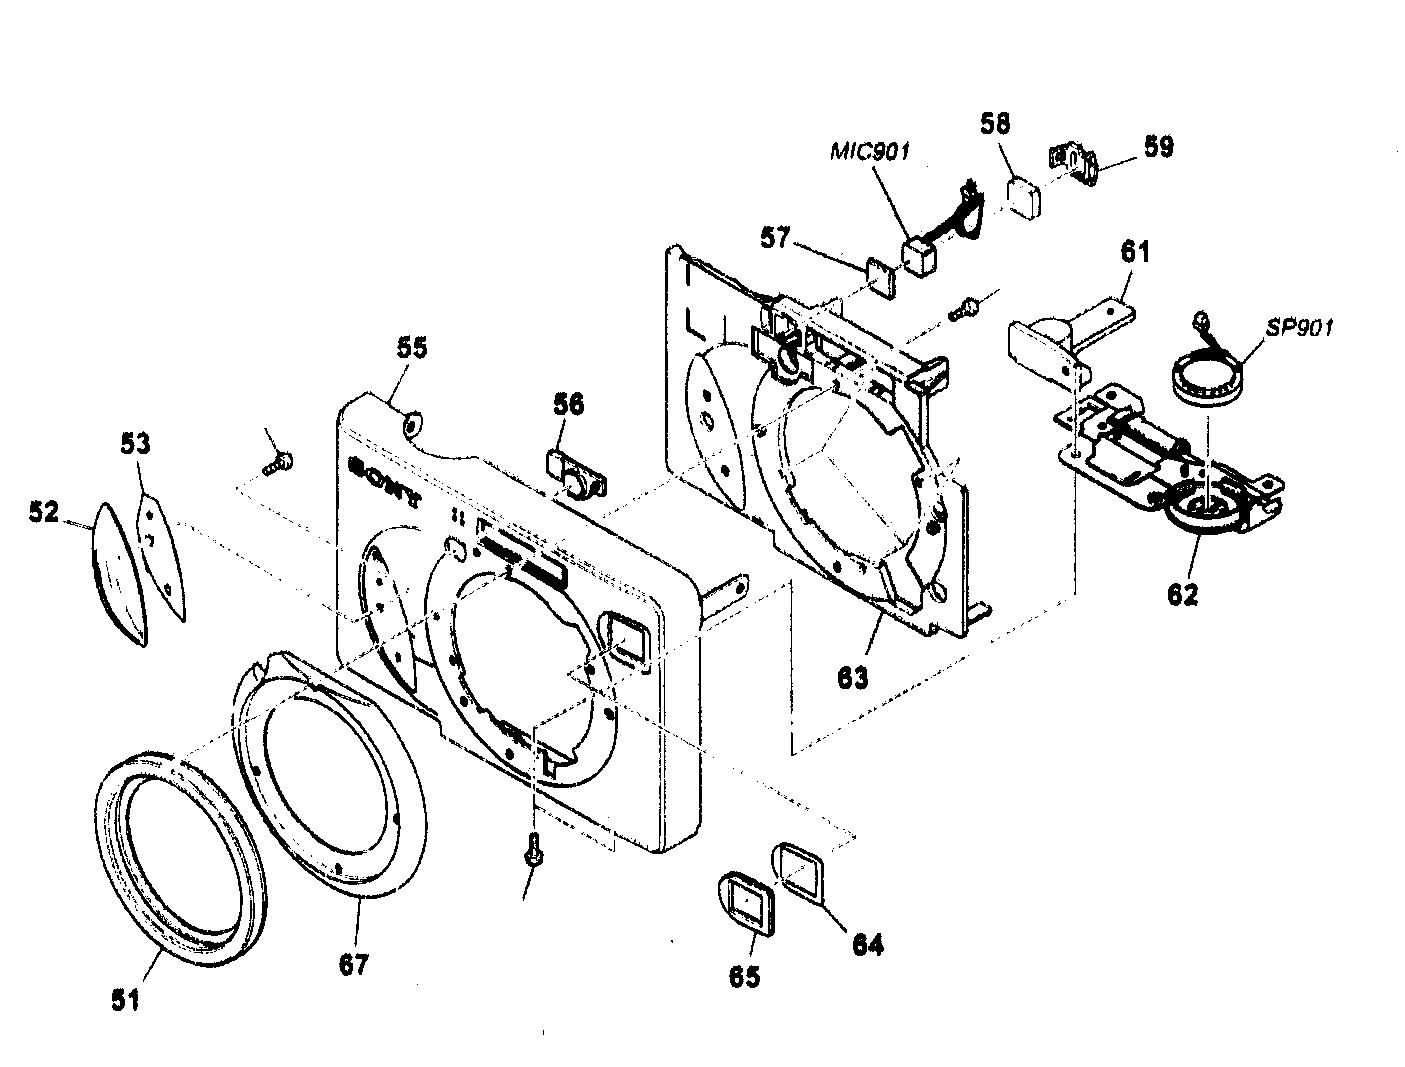 Sony model DSC-W7 cameras, all genuine parts